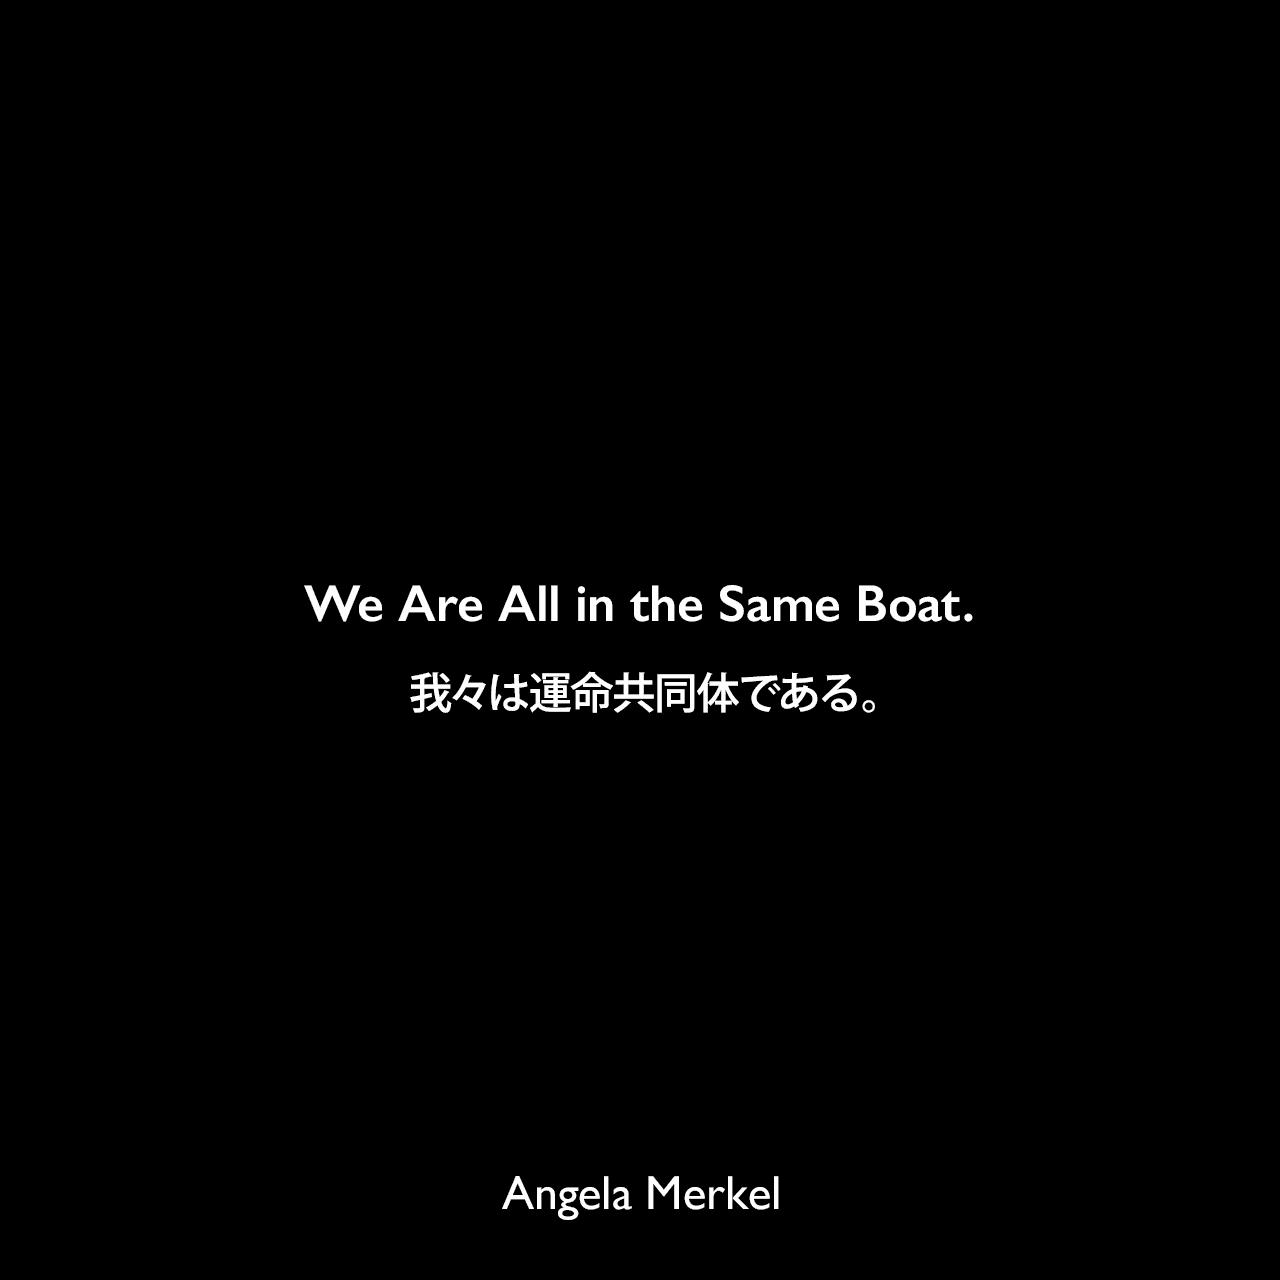 We Are All in the Same Boat.我々は運命共同体である。- 2013年6月、ドイツのニュース週刊誌「デア・シュピーゲル」よりAngela Merkel